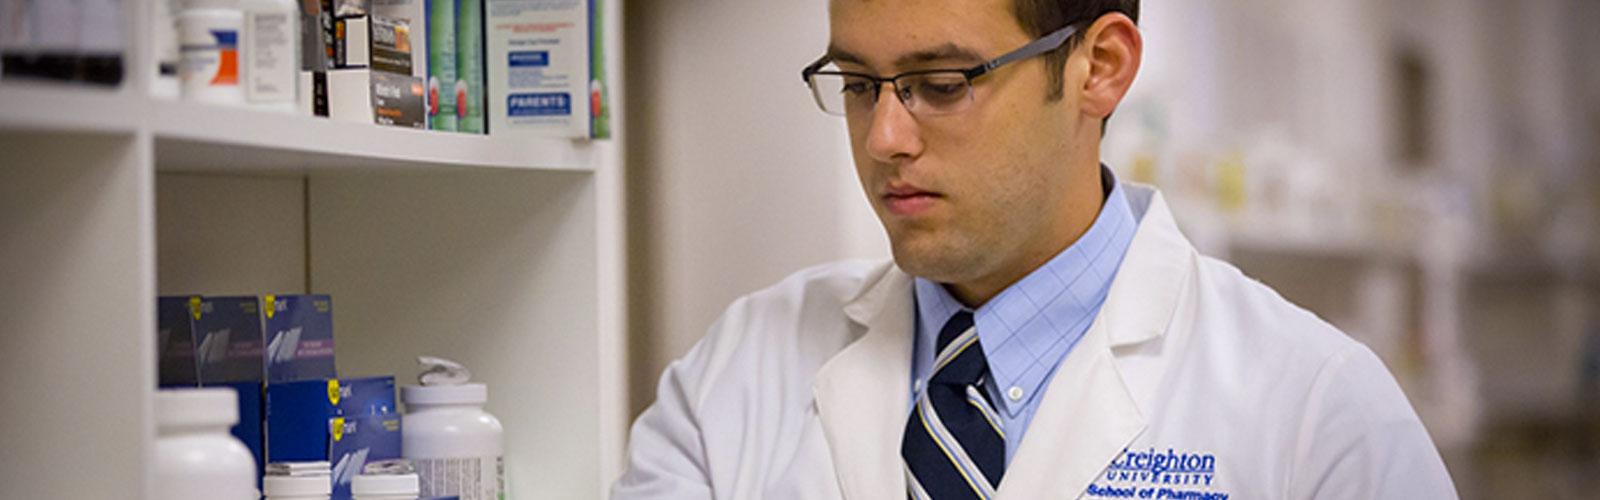 male student for Pharmacy Creighton University